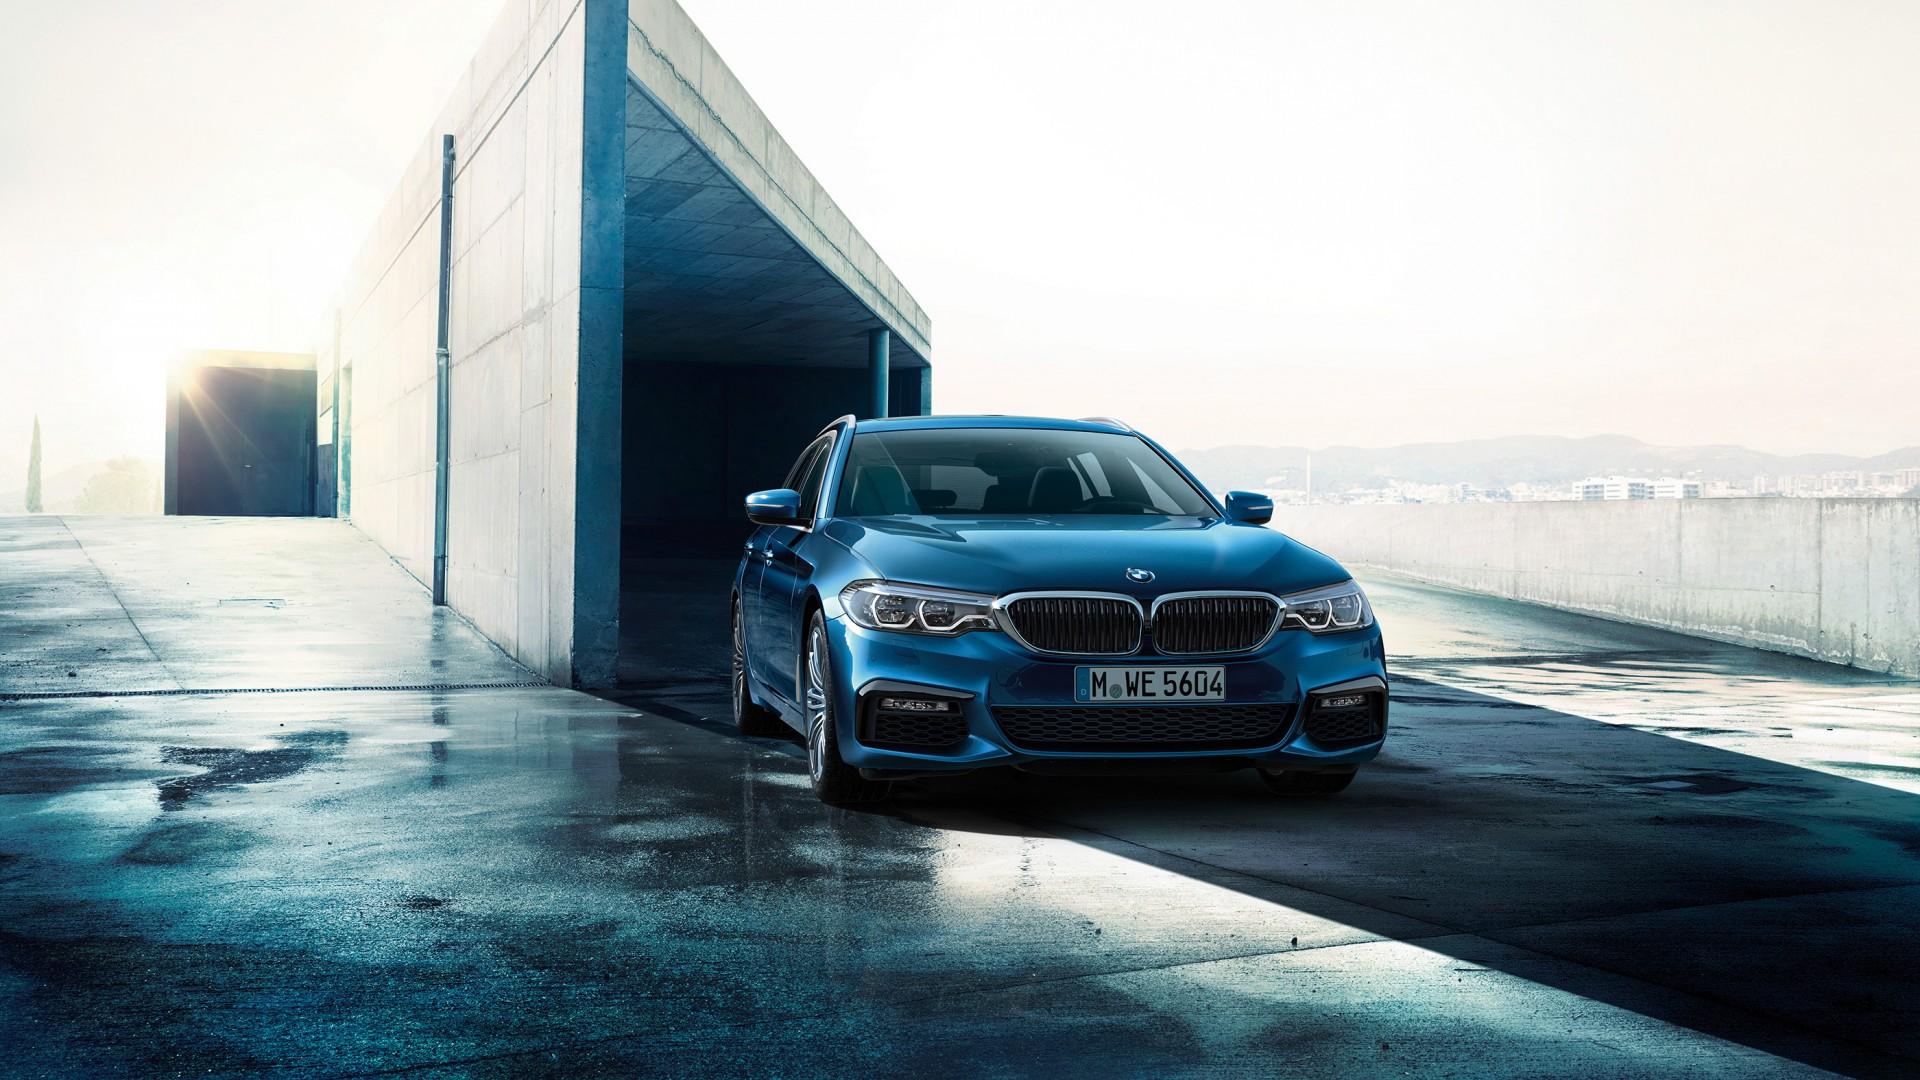 BMW Alpina B6 >> BMW 5er Touring G31 2017 Wallpaper | HD Car Wallpapers ...